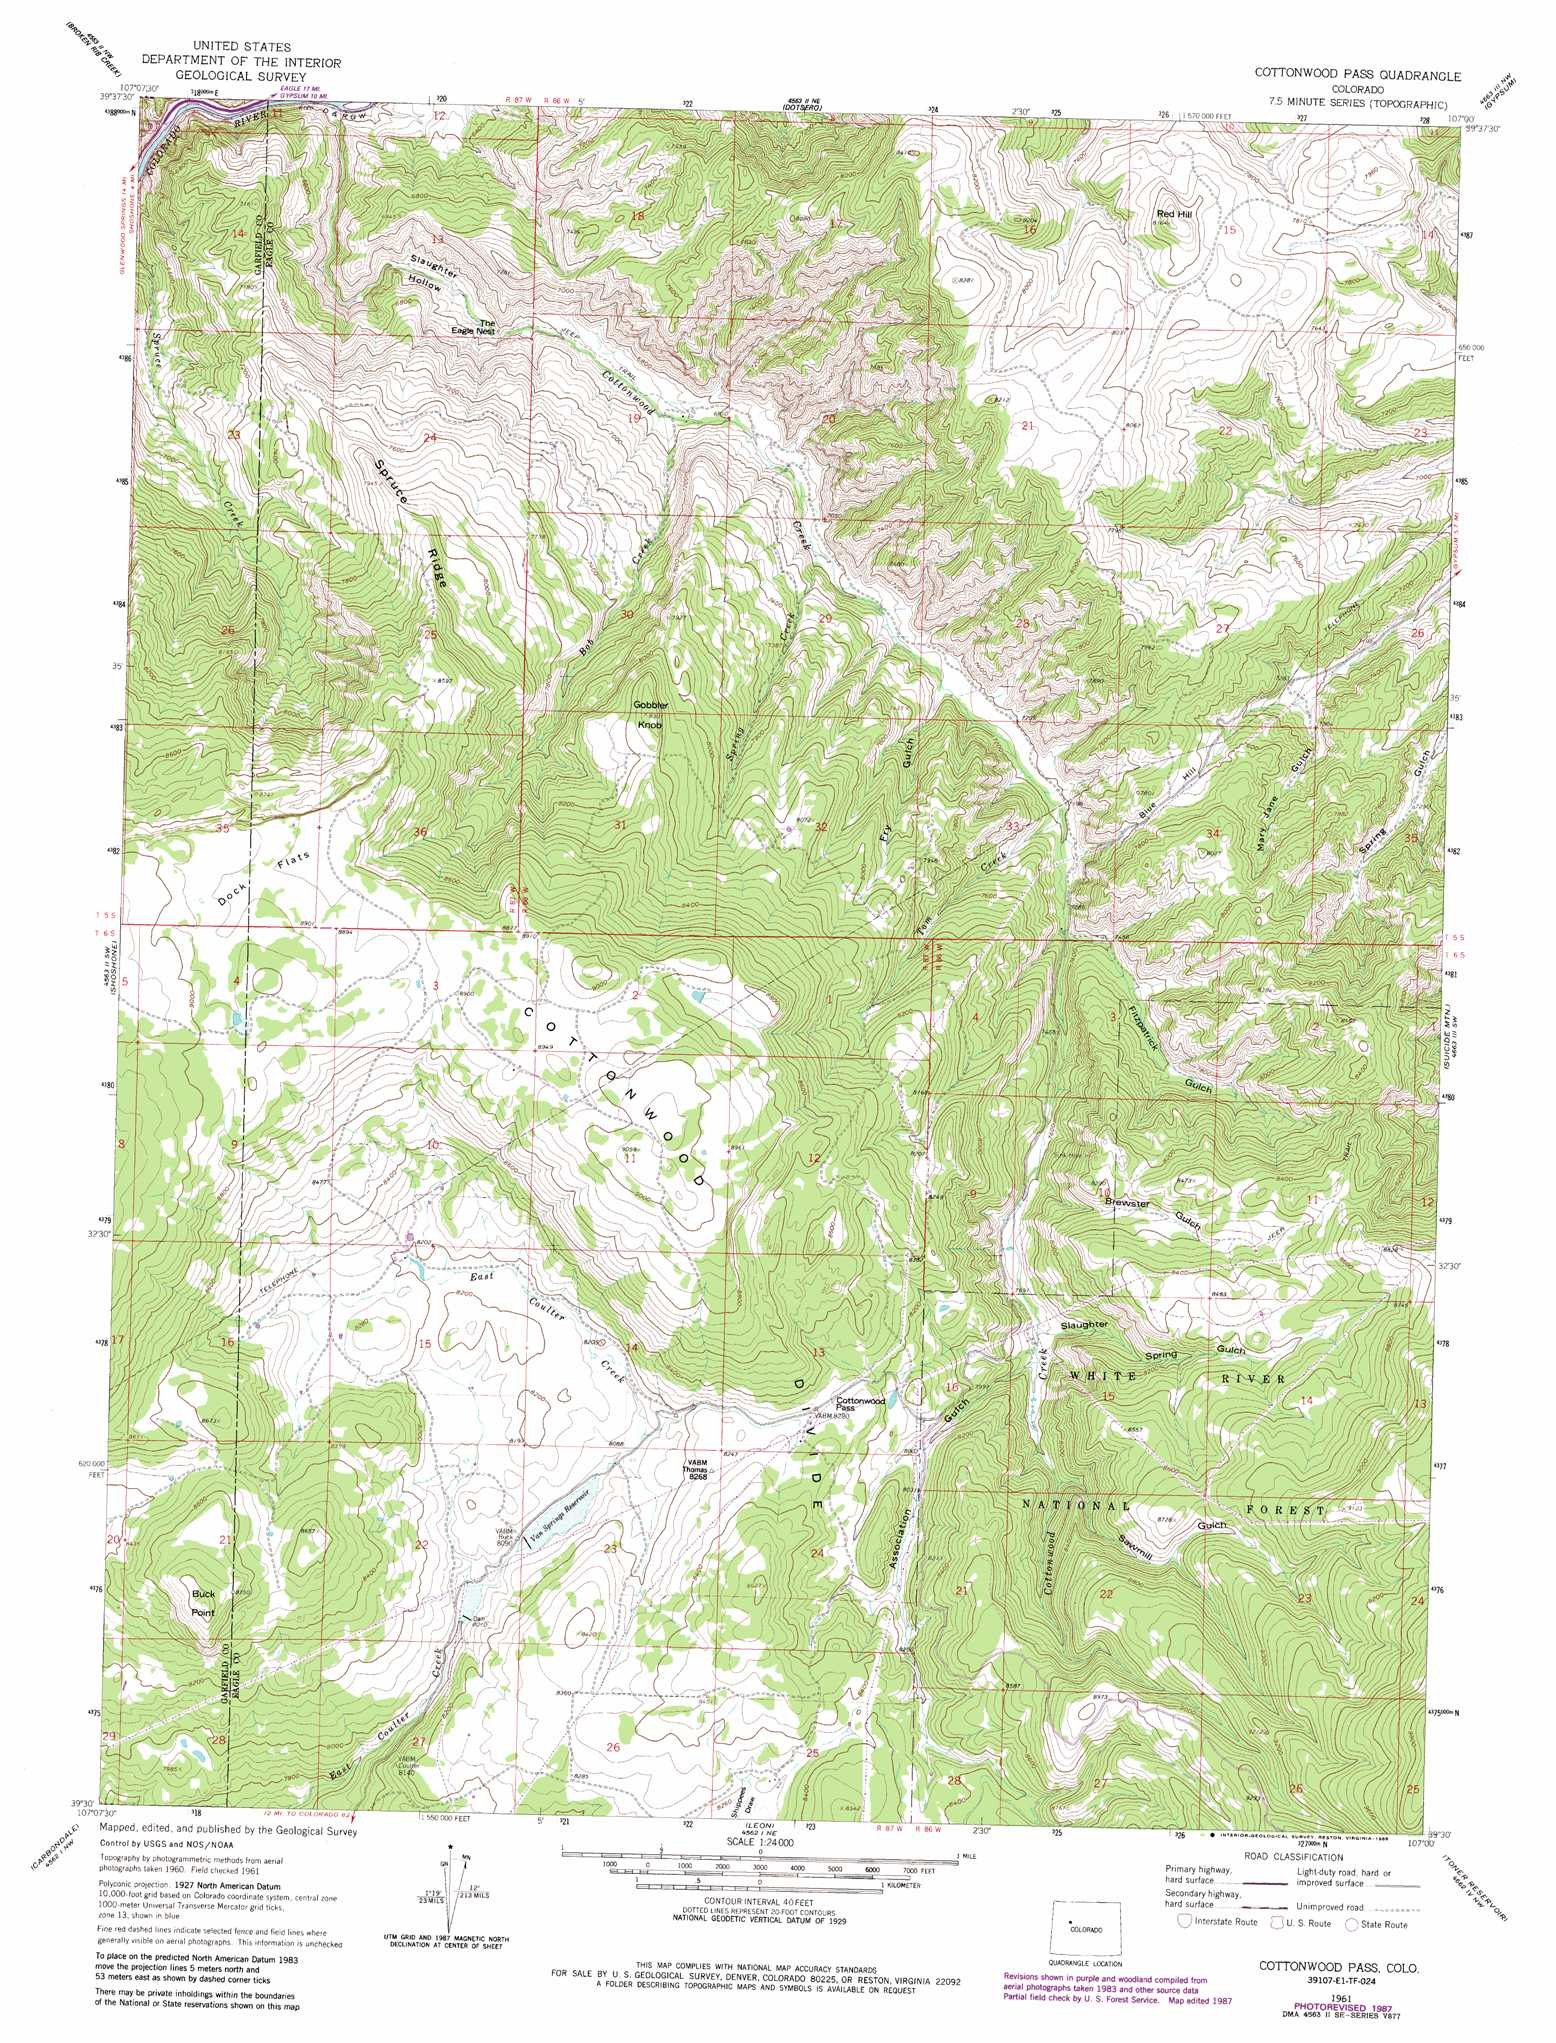 Cottonwood Pass topographic map, CO   USGS Topo Quad 39107e1